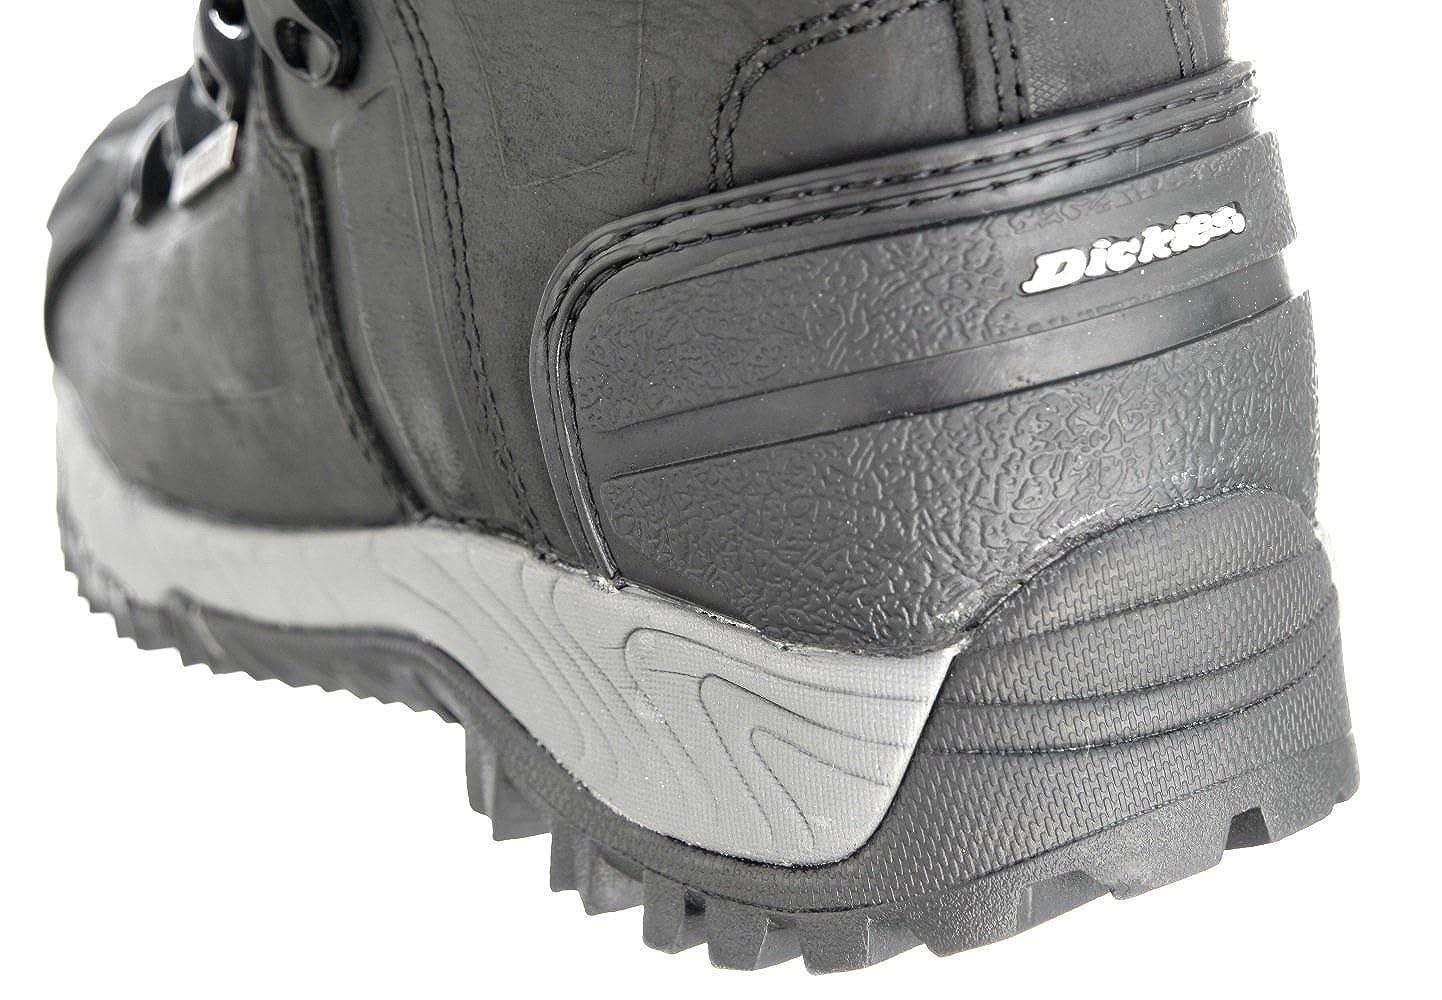 Schuhgr/ö/ße:40 Dickies gef/ütterte Winterschuhe Arbeitsschuhe S3 Medway UK 6.5 Farbe:schwarz